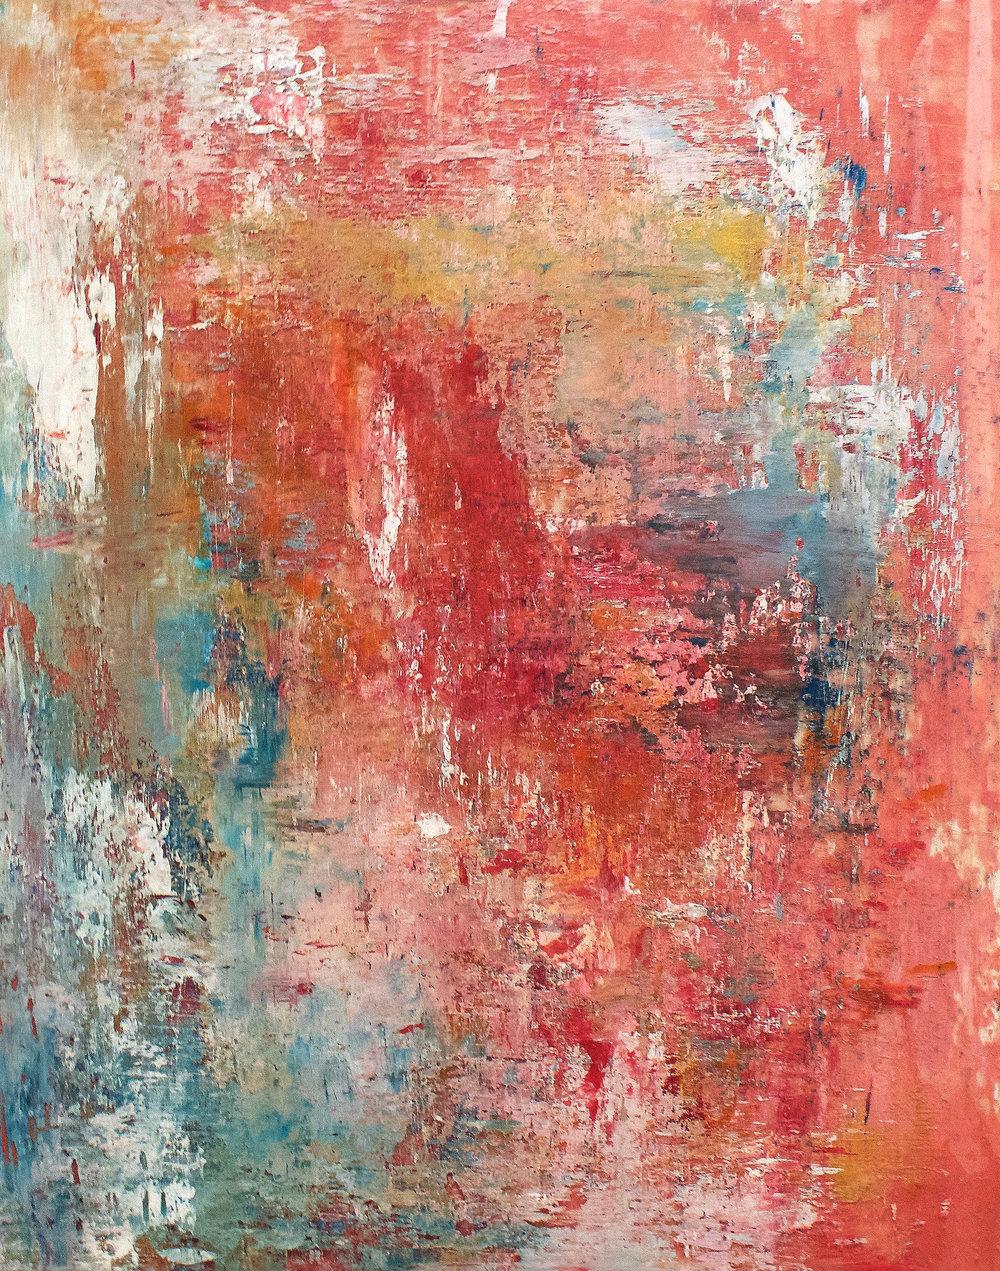 Jacqueline Ferrante, Haze II, 2016, Acrylic on Dura-Lar, 14 x 11 inches